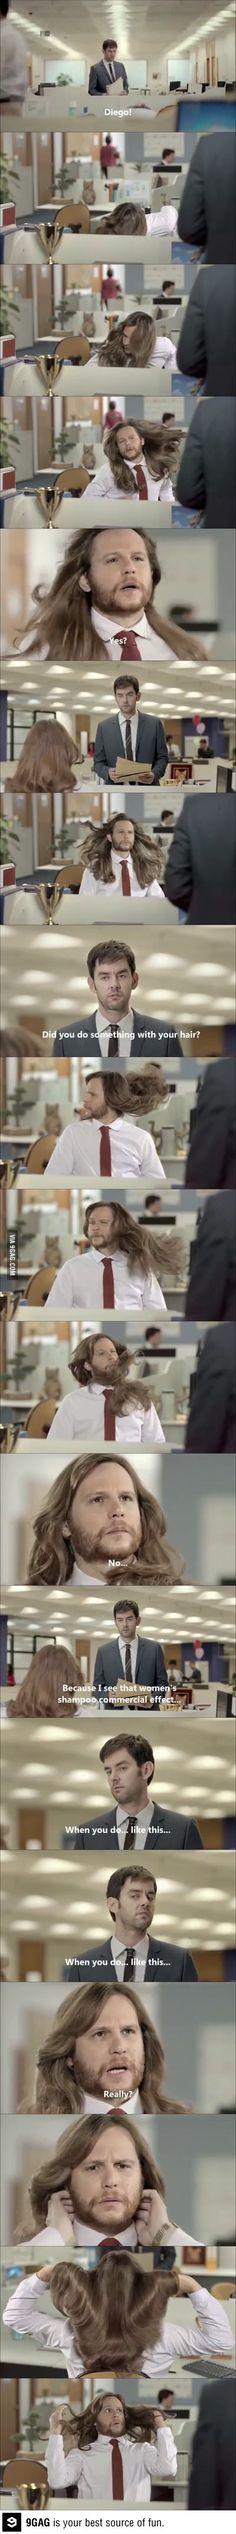 The shampoo effect